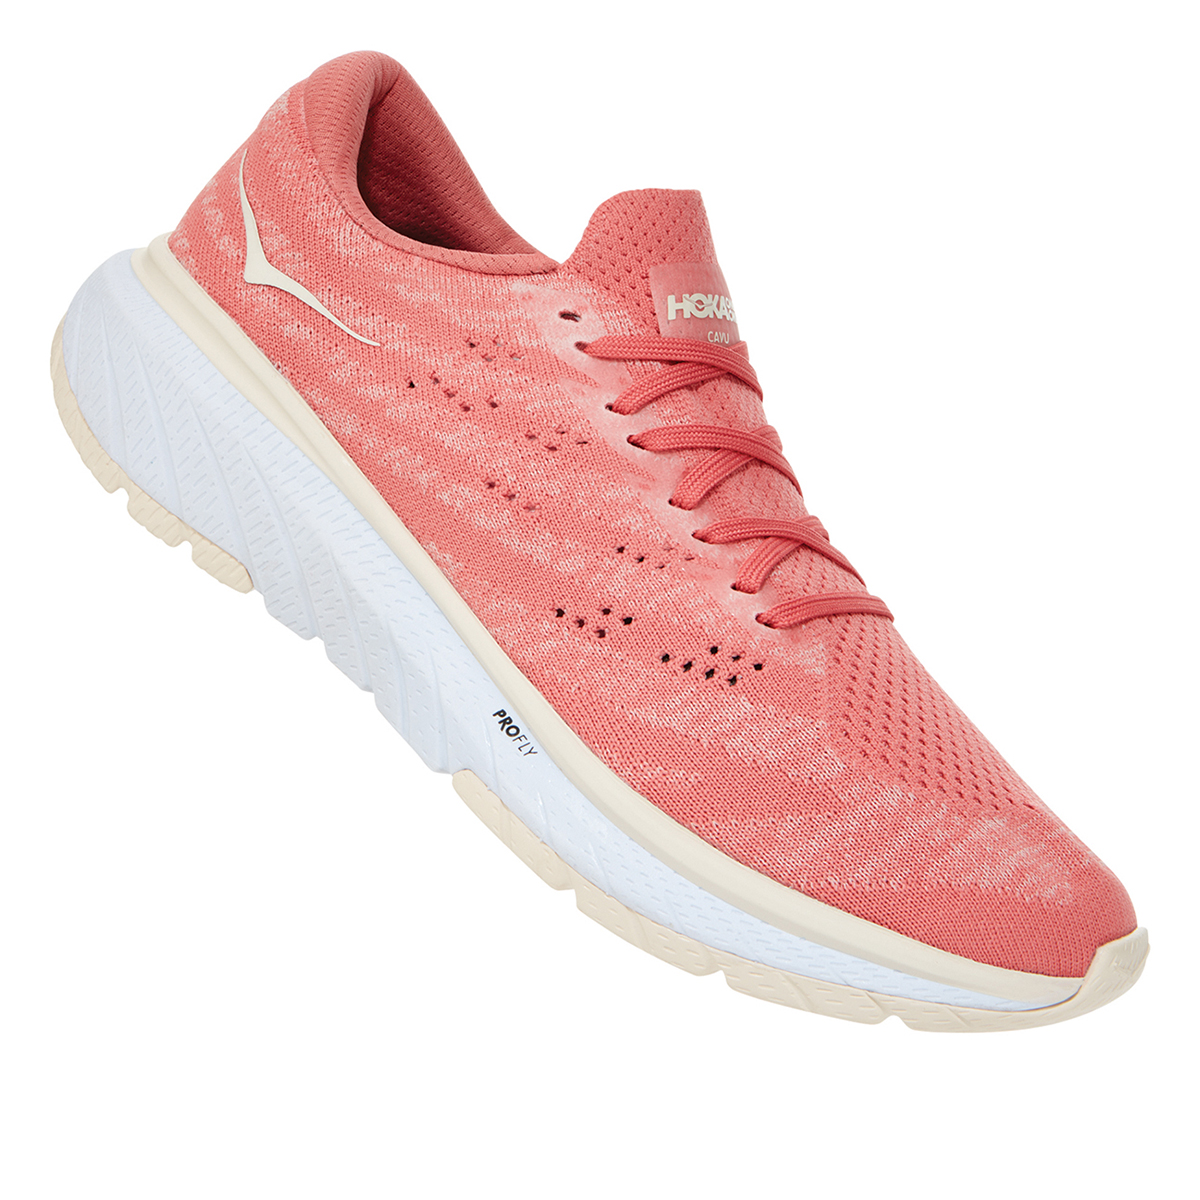 Women's Hoka One One Cavu 3 Running Shoe - Color: Lantana/Eggnog - Size: 5 - Width: Regular, Lantana/Eggnog, large, image 5